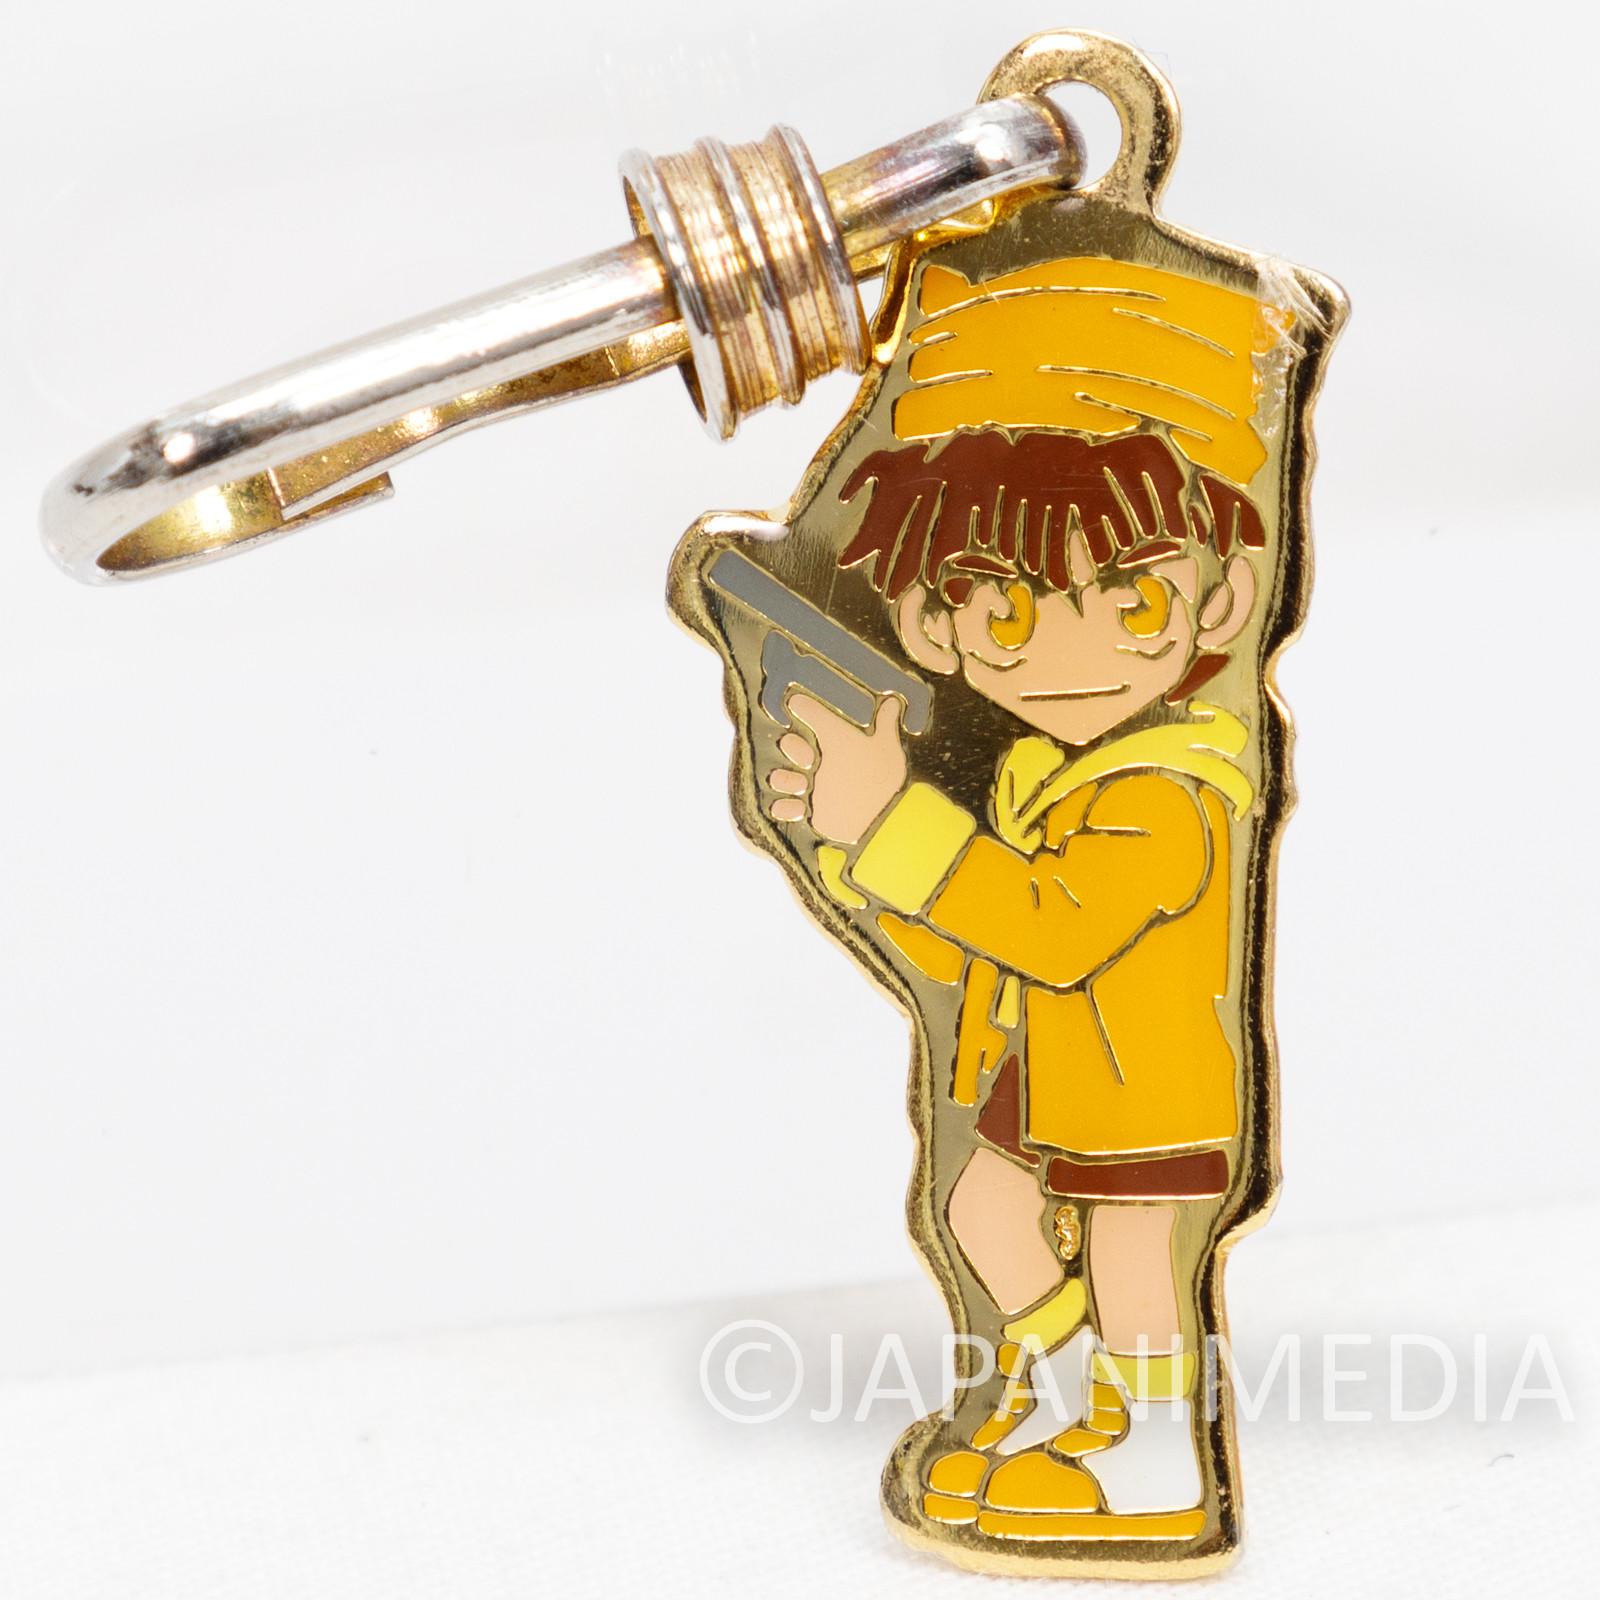 Gensomaden SAIYUKI Son Goku Fastener Mascot Charm JAPAN ANIME MANGA